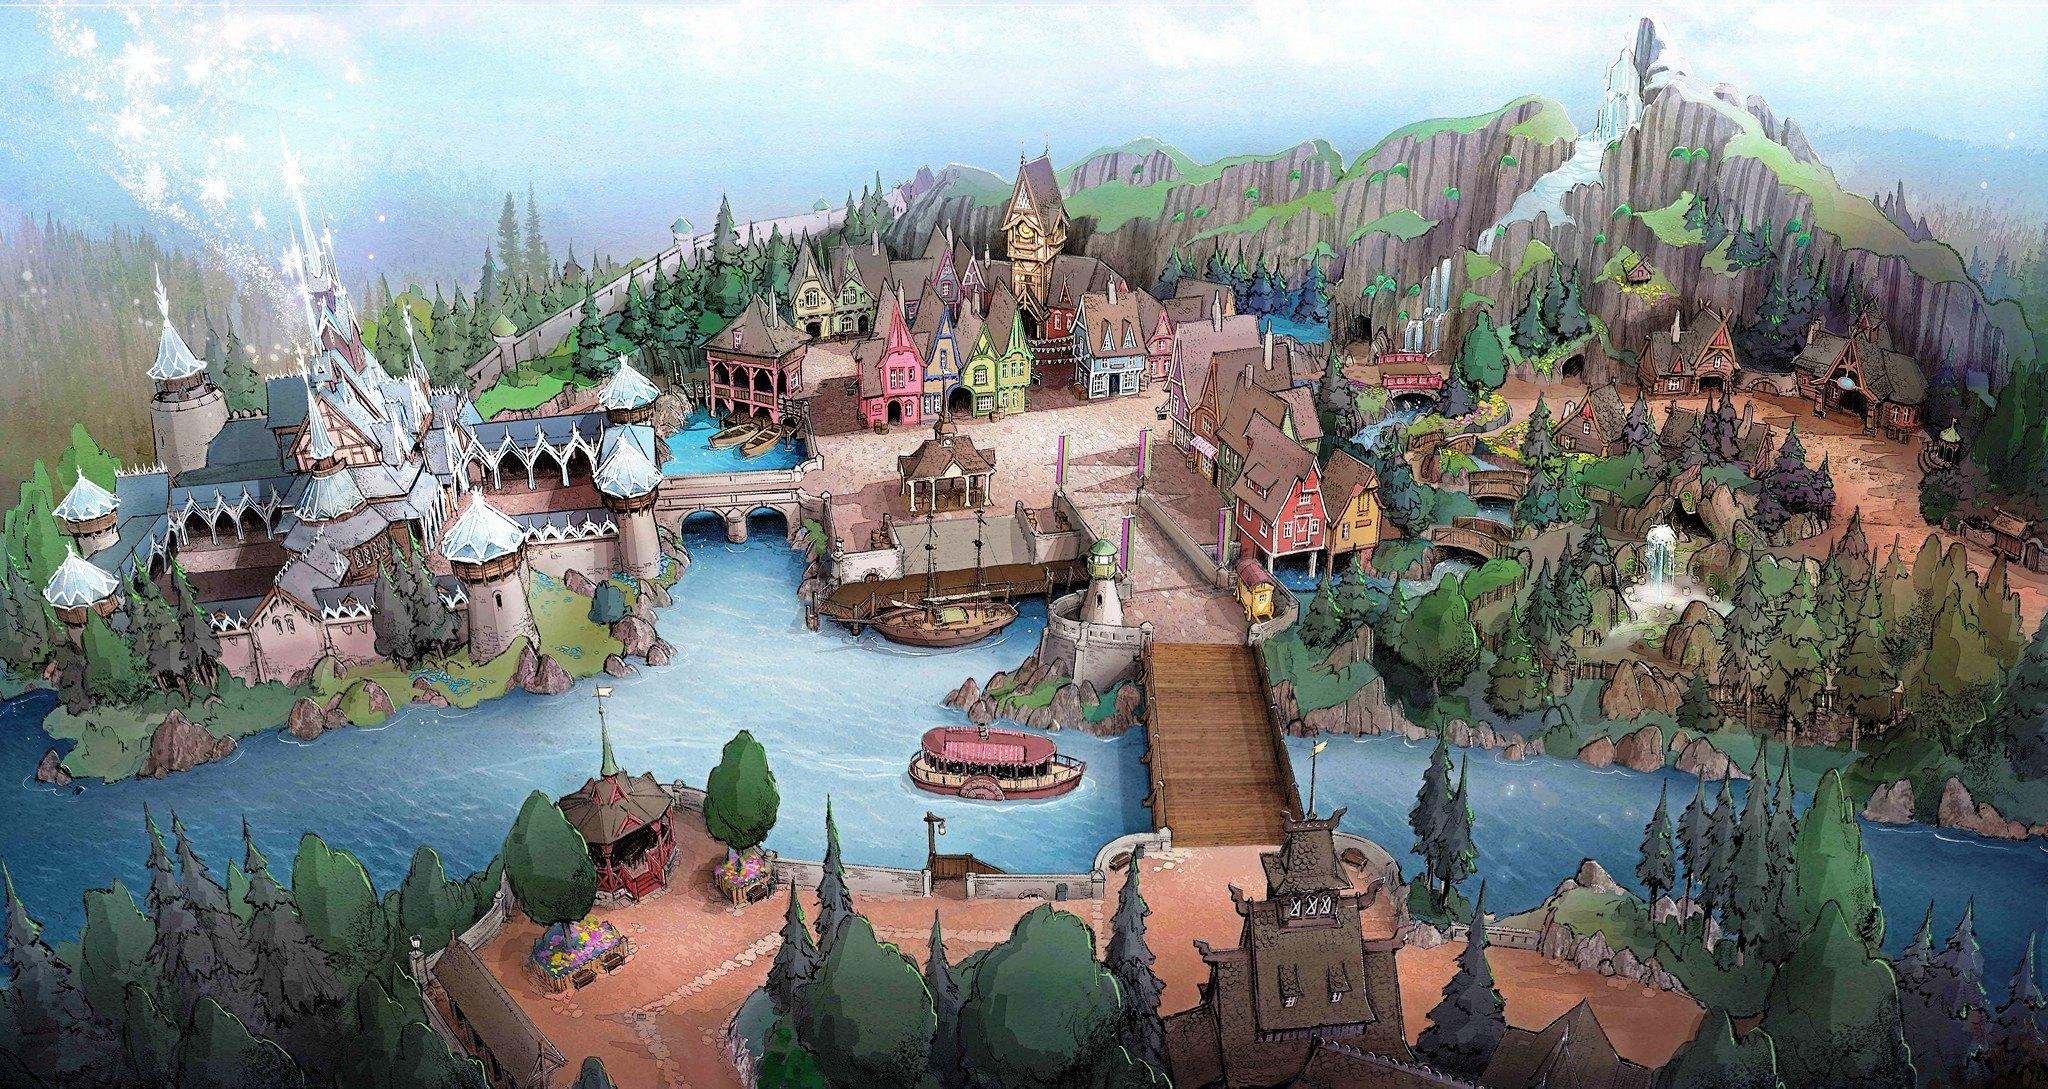 ecb6f7ab9 Arendelle: World of Frozen | Disney Wiki | FANDOM powered by Wikia